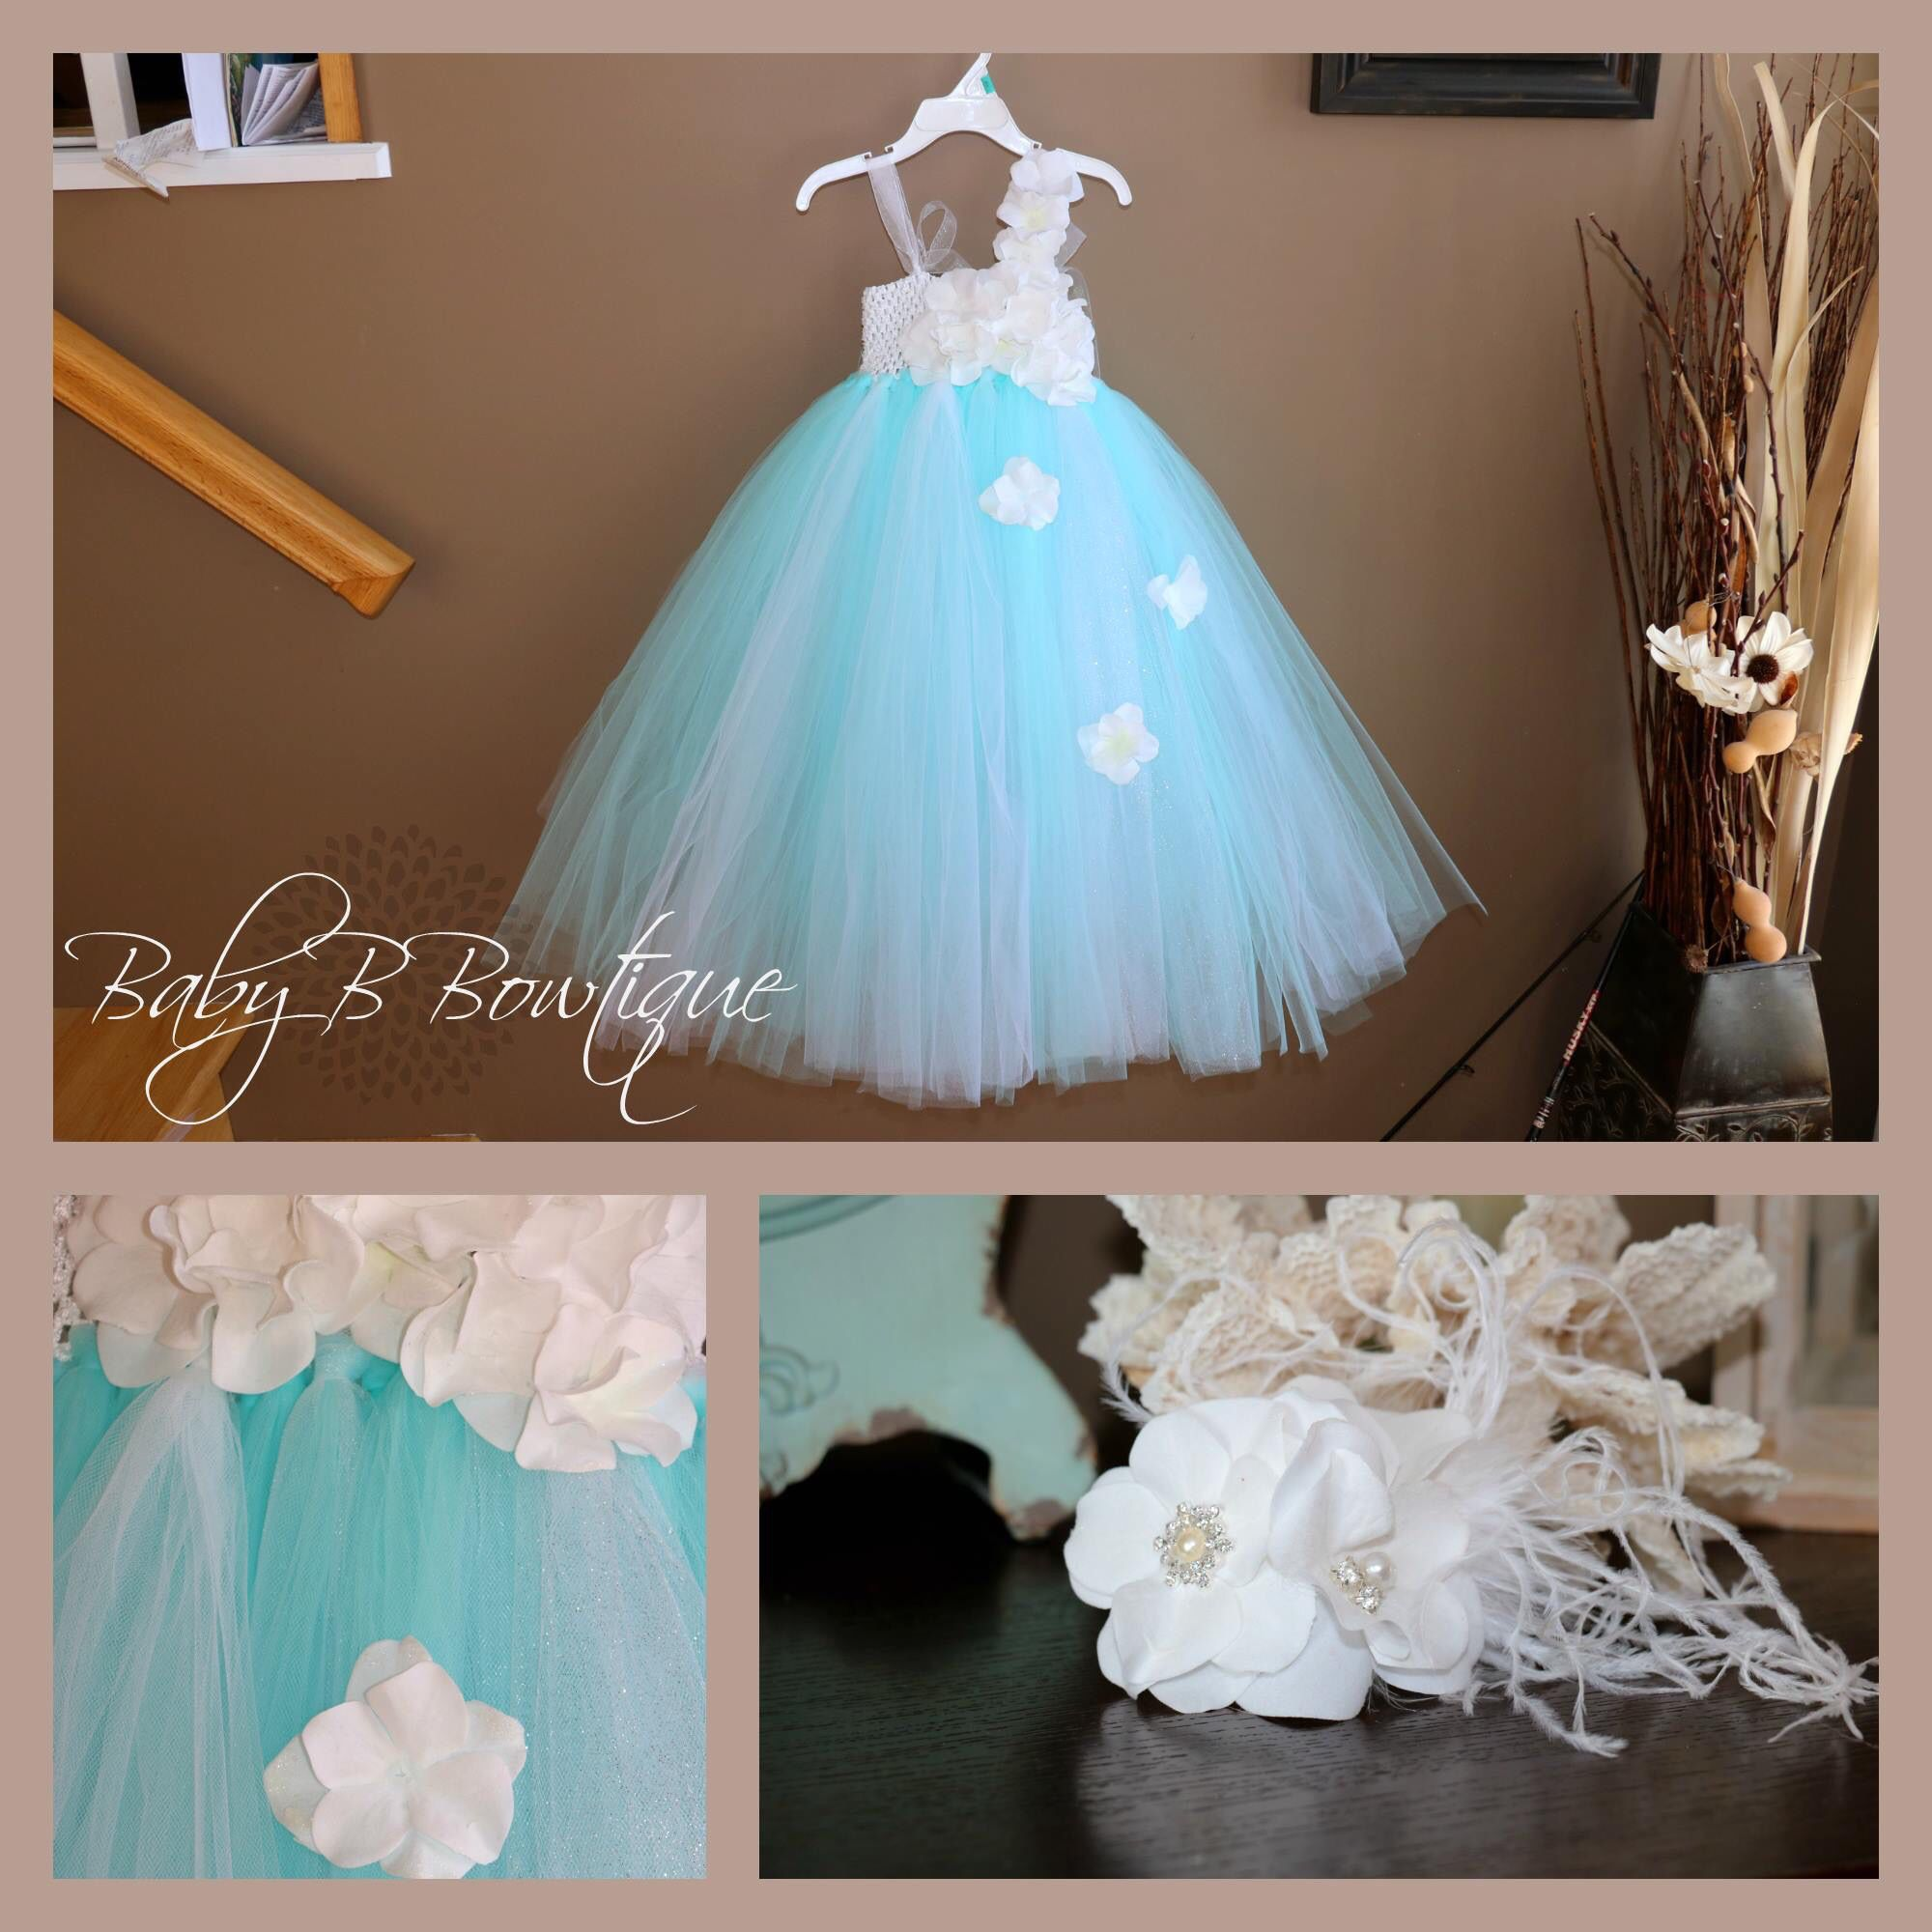 White Wedding Gown Hydrangea: Hydrangea White And Aqua Tutu Dress